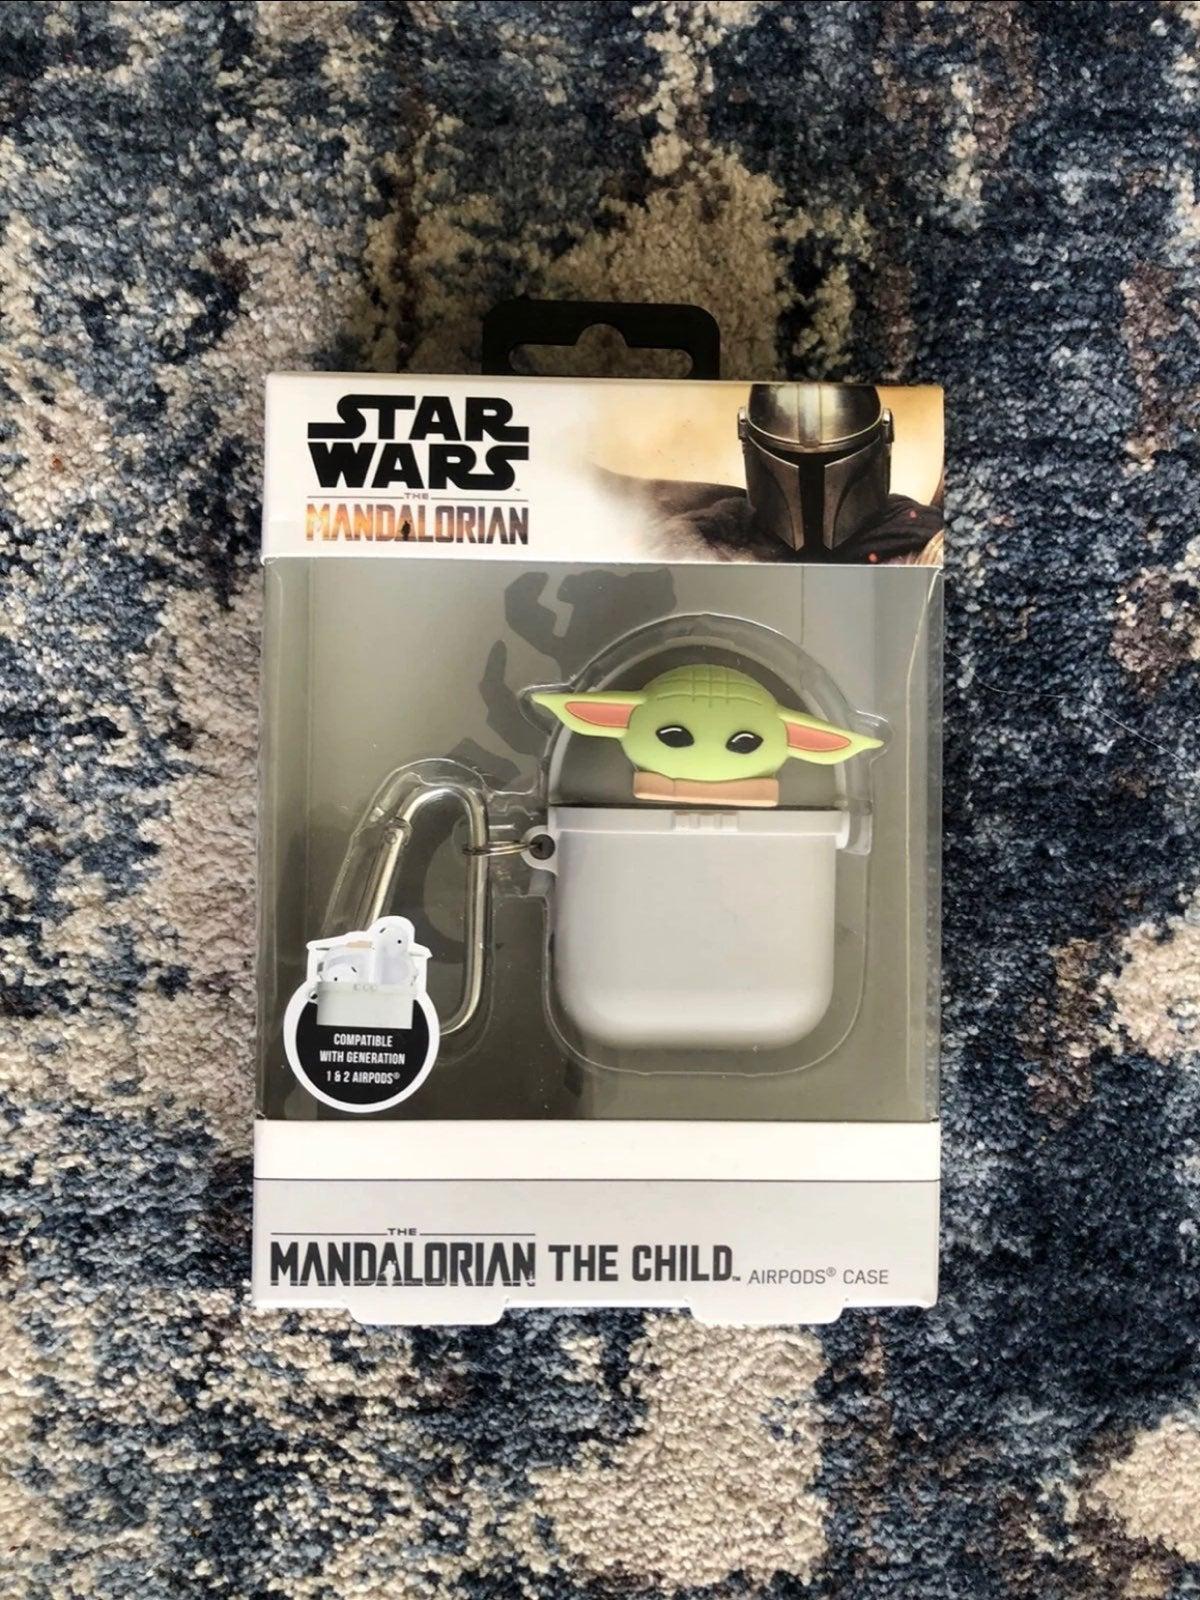 Star Wars The Mandalorian airpod case